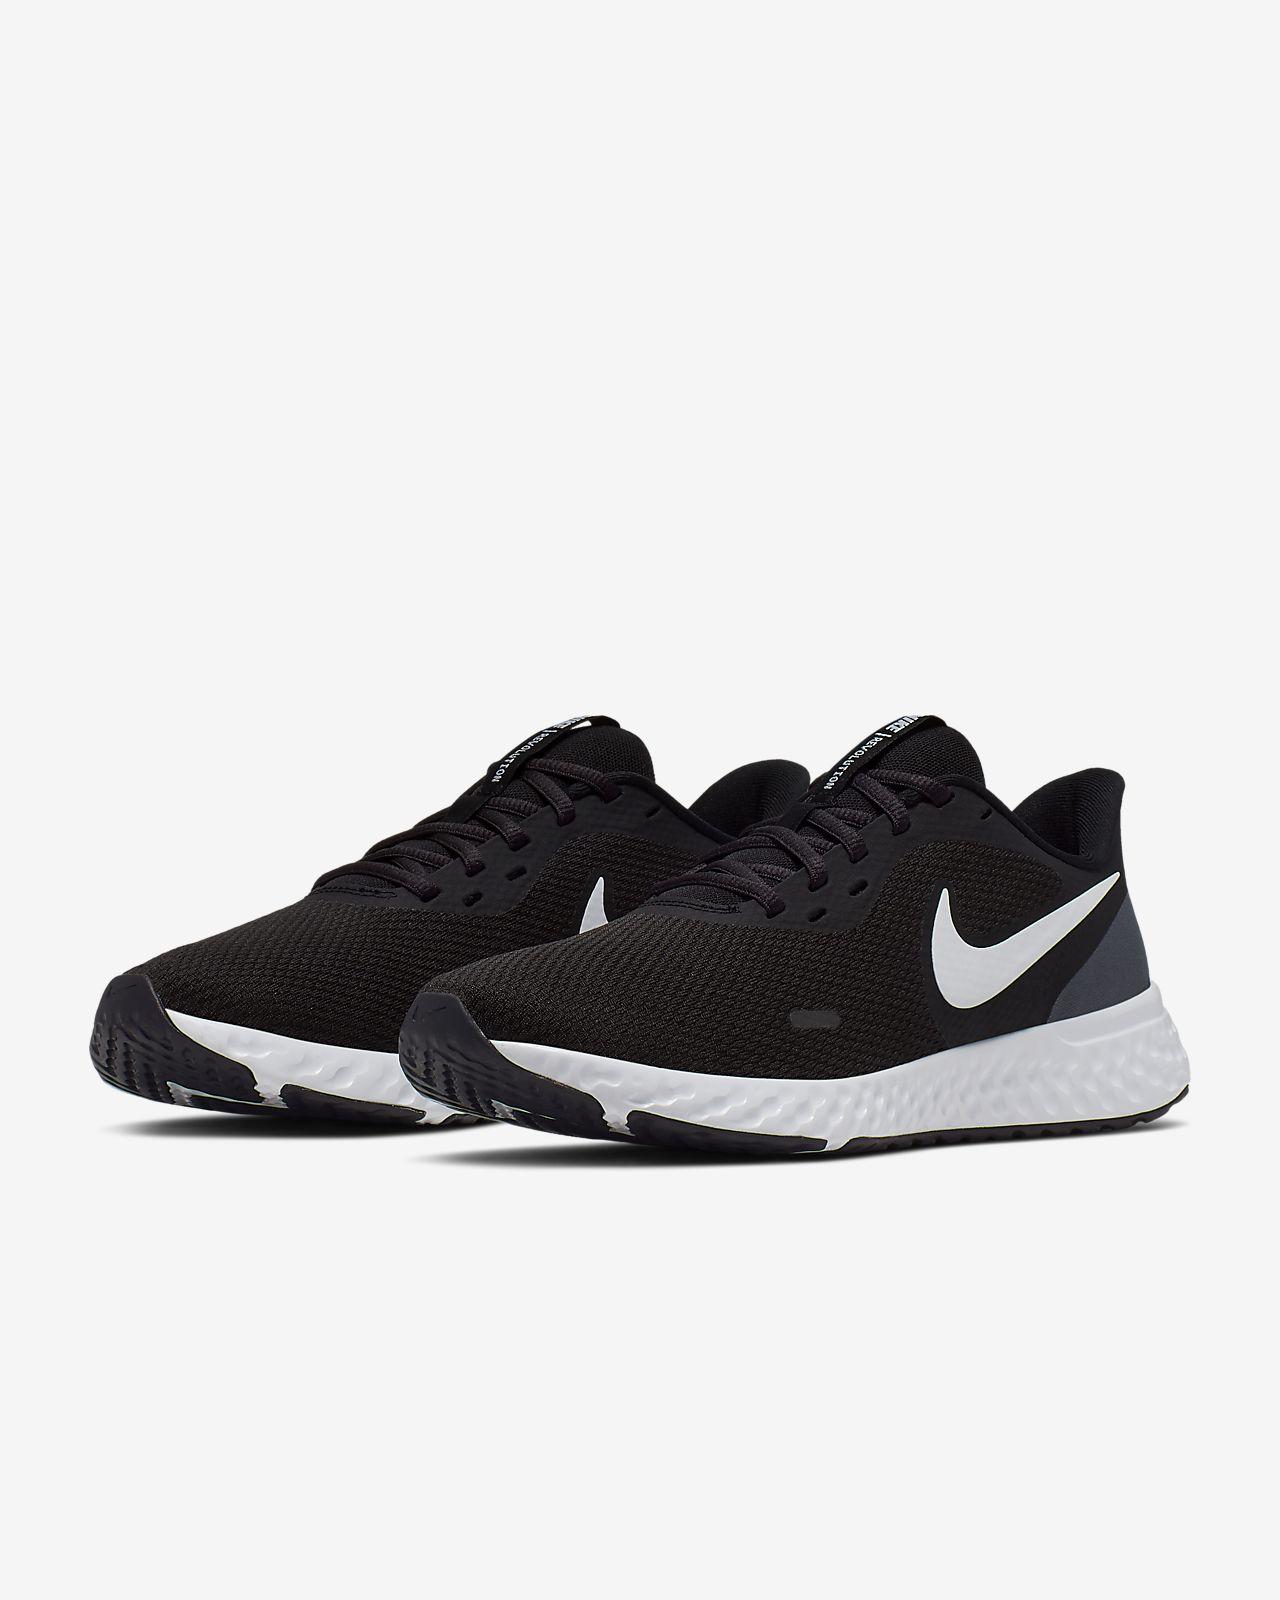 Nike Revolution Downshifter Sneaker Damen Kids Freizeit Laufschuhe Gr 37,5 38,5